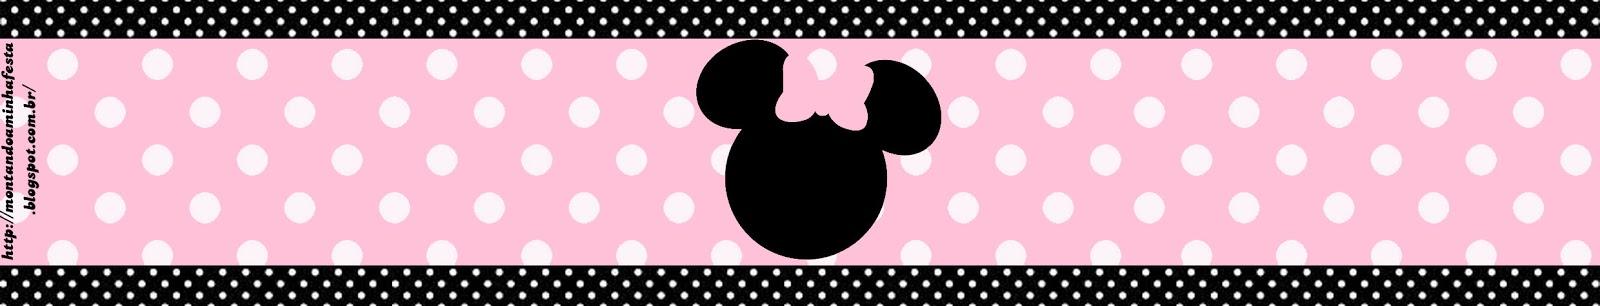 Rótulo para bala de goma gomets Minnie rosa e preto